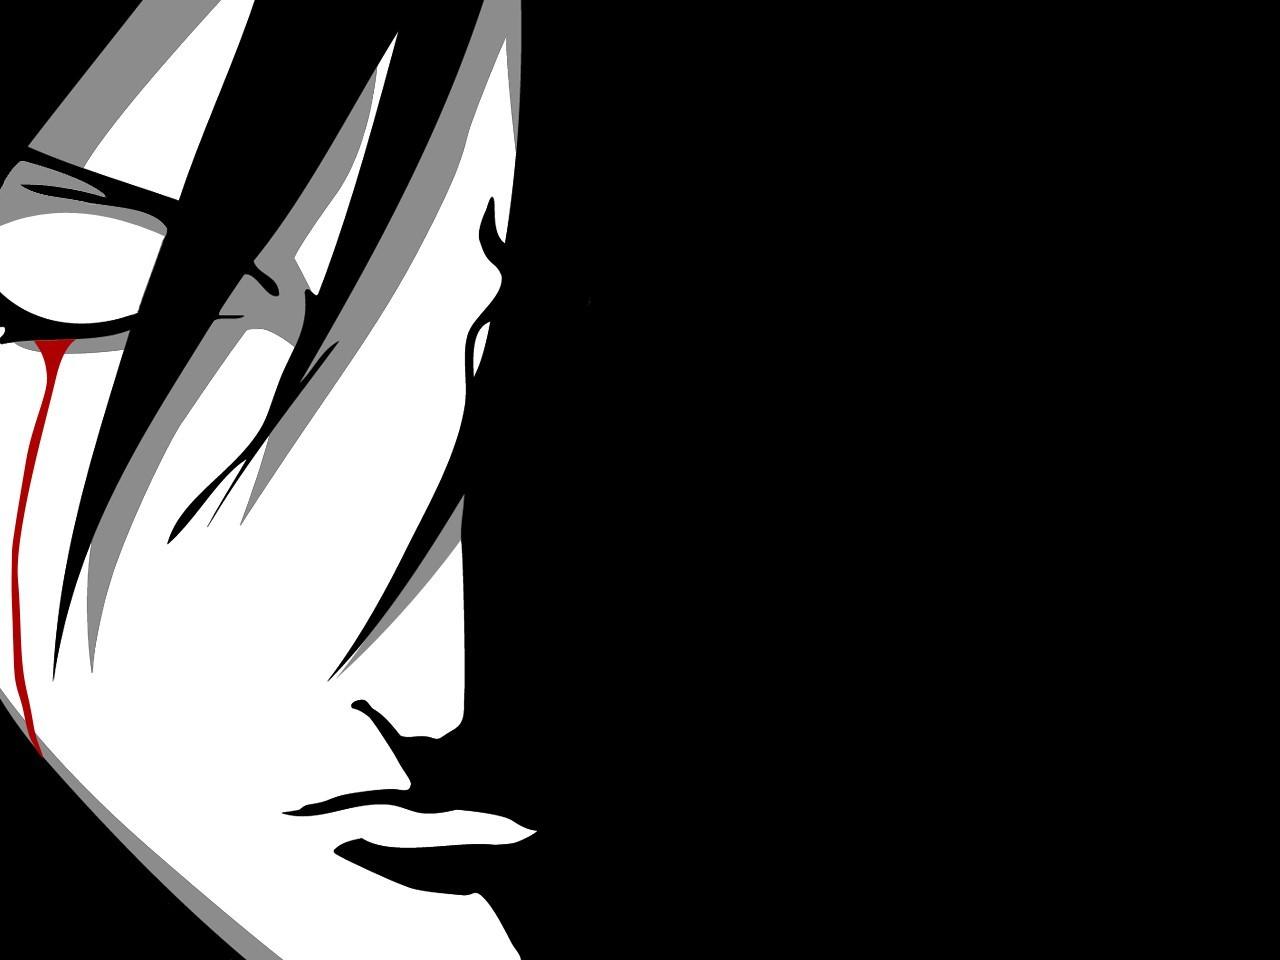 Fondos de pantalla  monocromo Ojos cerrados Anime dibujos